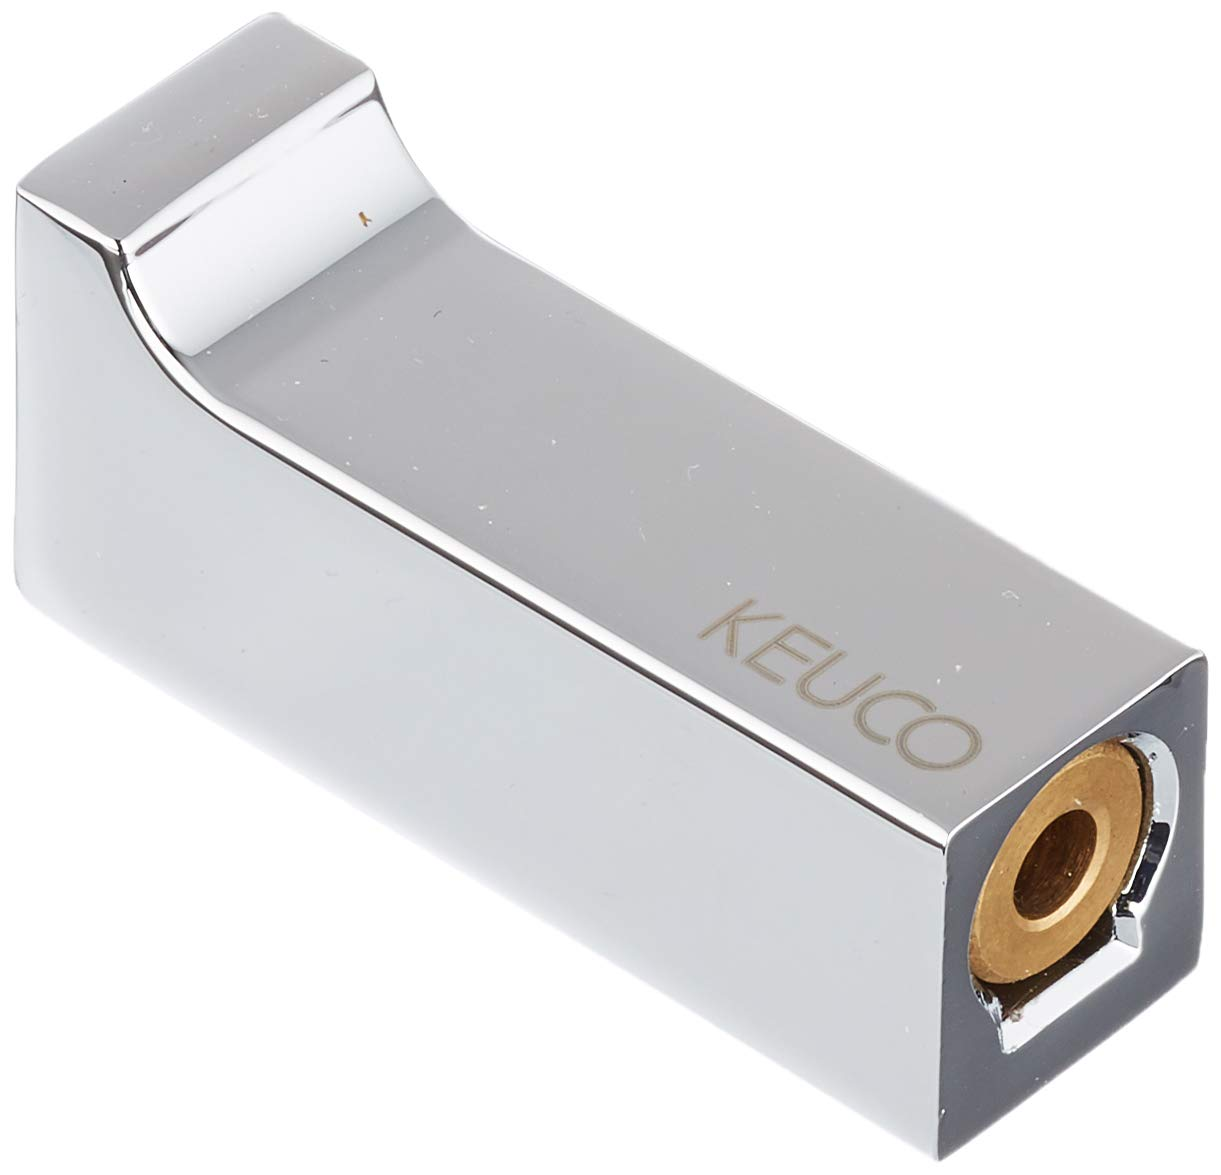 Escobillero para WC Color Cromo Keuco 11164019000 Edition 11 11164 con Accesorio de Cristal